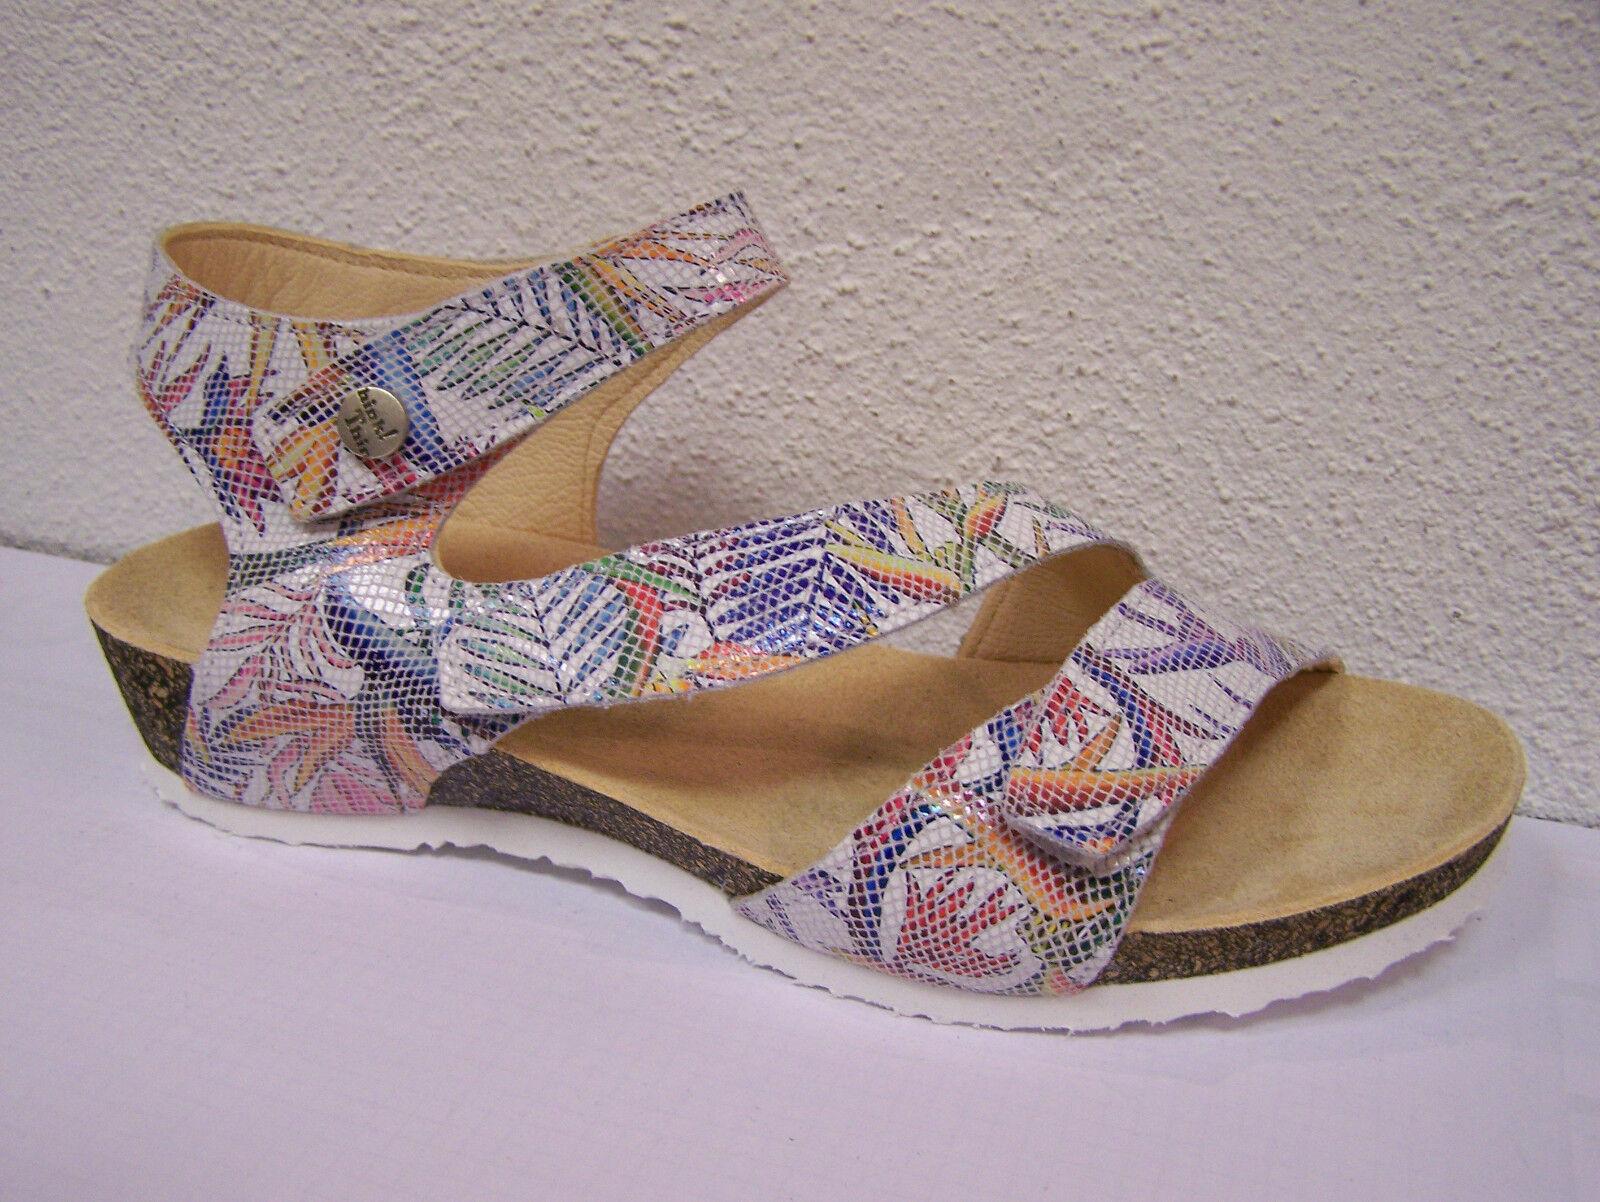 Think Dumia incl. scarpe effetto BIANCO effetto scarpe hippie, blumenprint! incl 57c398